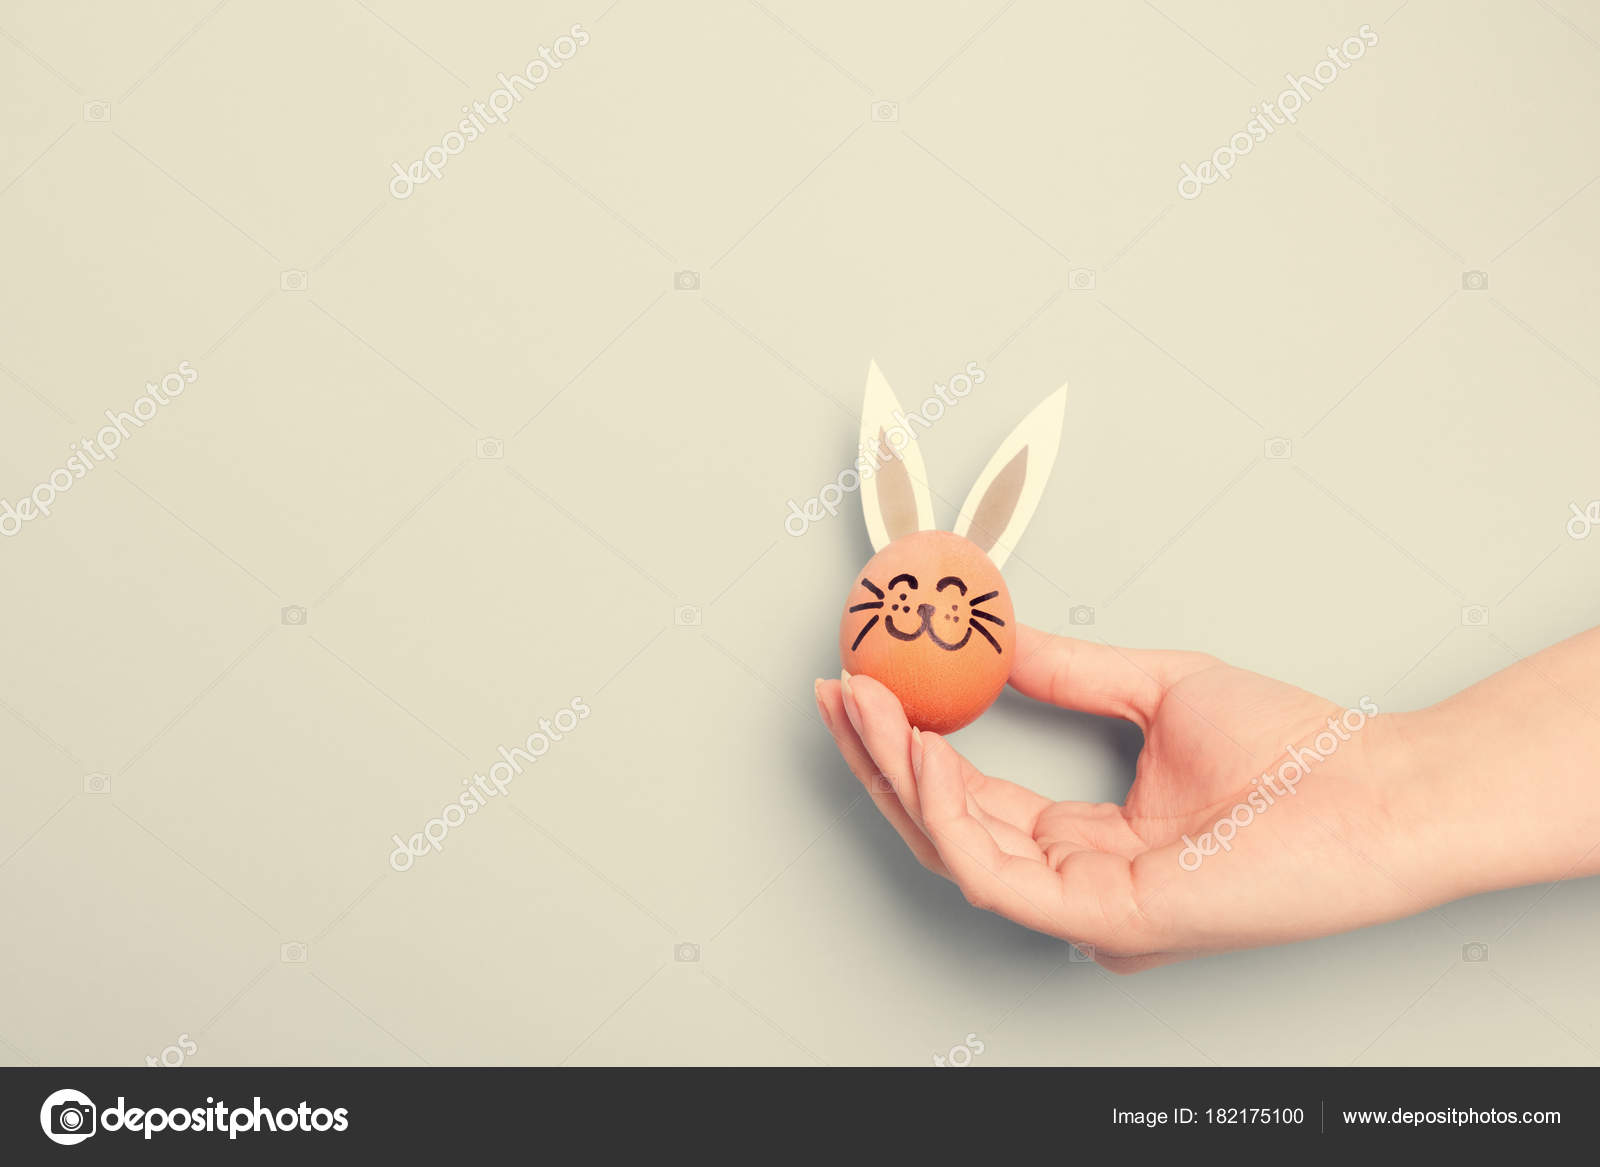 64fa887d888 Ένα Χέρι Που Κρατά Μικρή Λαγουδάκι Του Πάσχα Αυτιά Χαρτί– εικόνα αρχείου